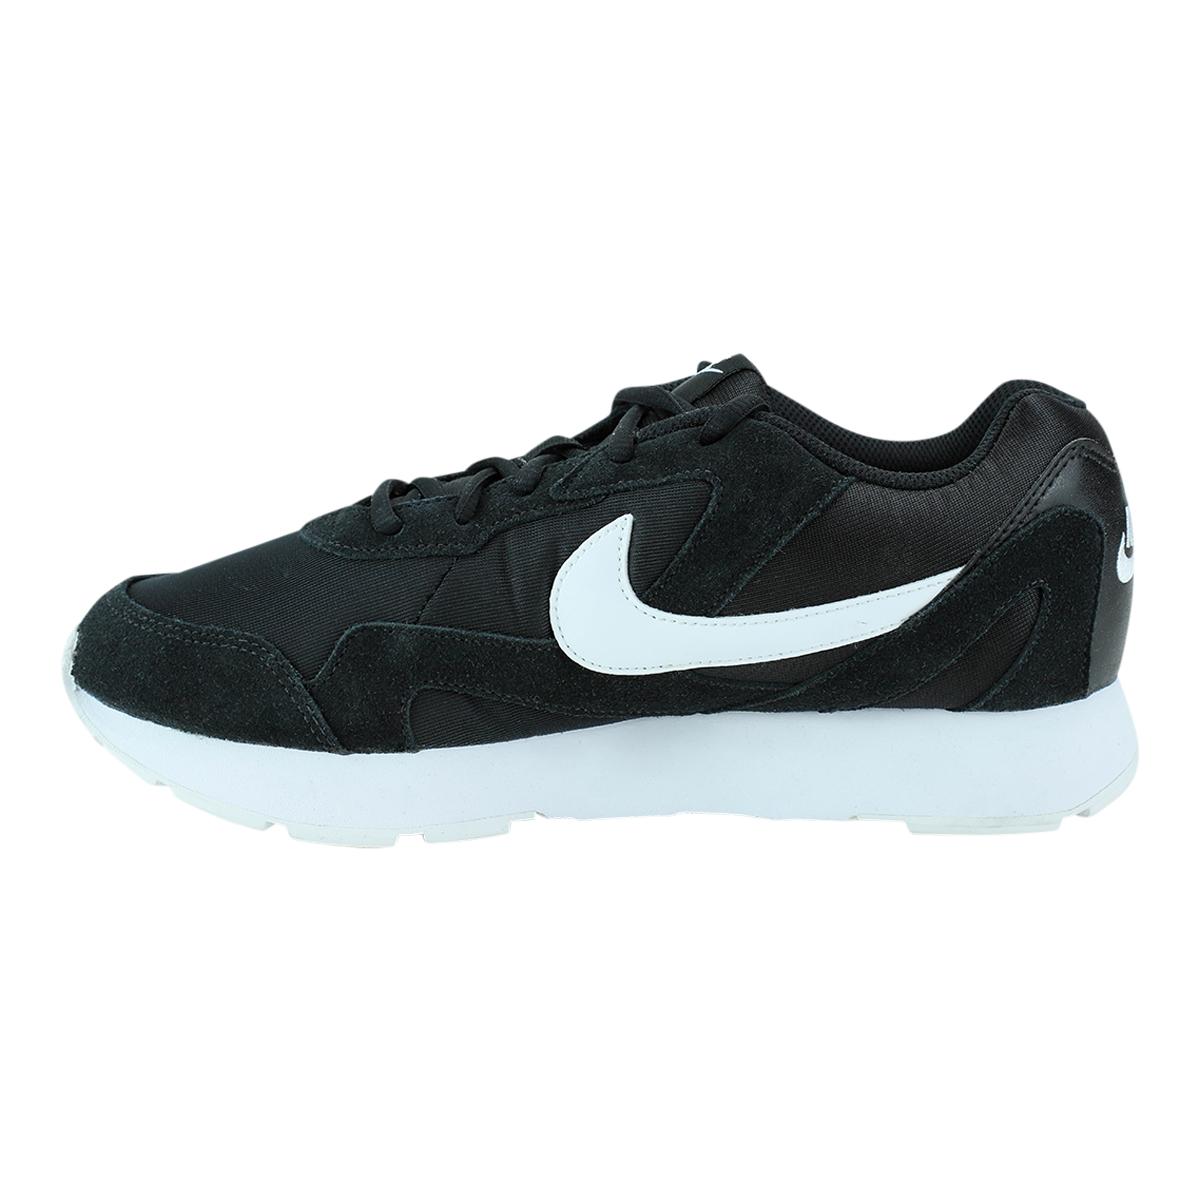 Nike-Men-039-s-Delfine-Running-Shoes thumbnail 10